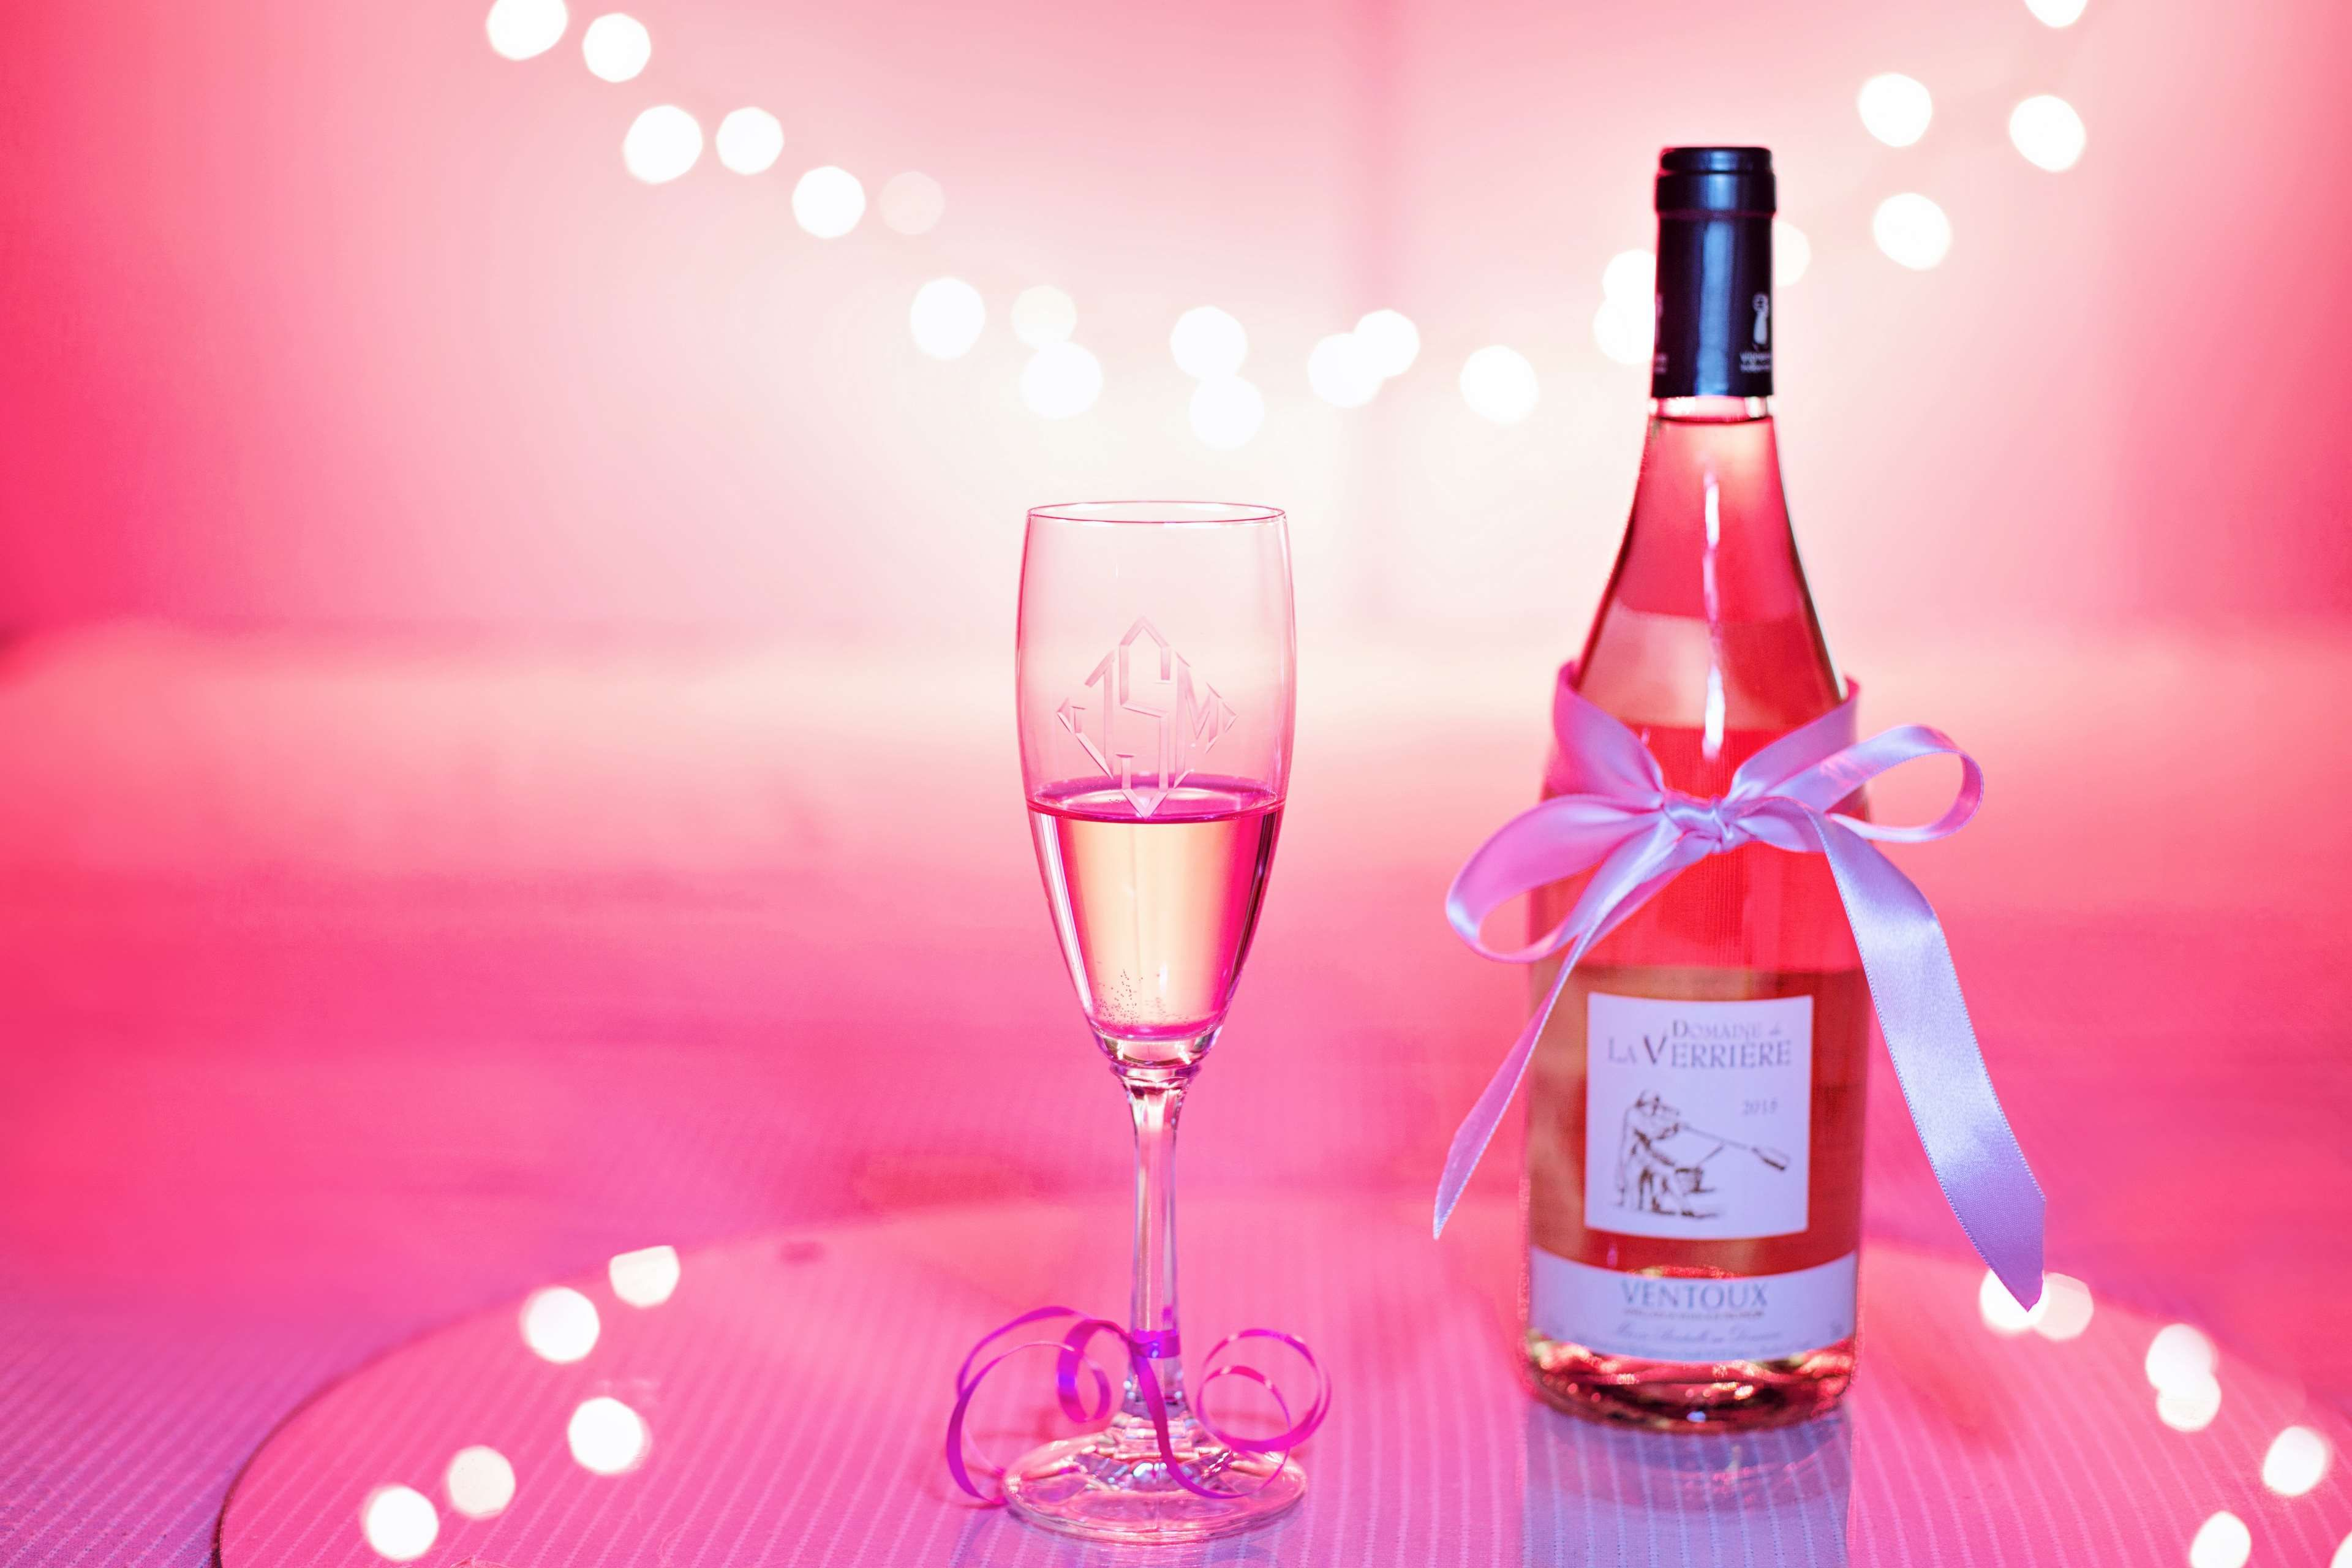 alcohol, anniversary, beverage, birthday, bottle